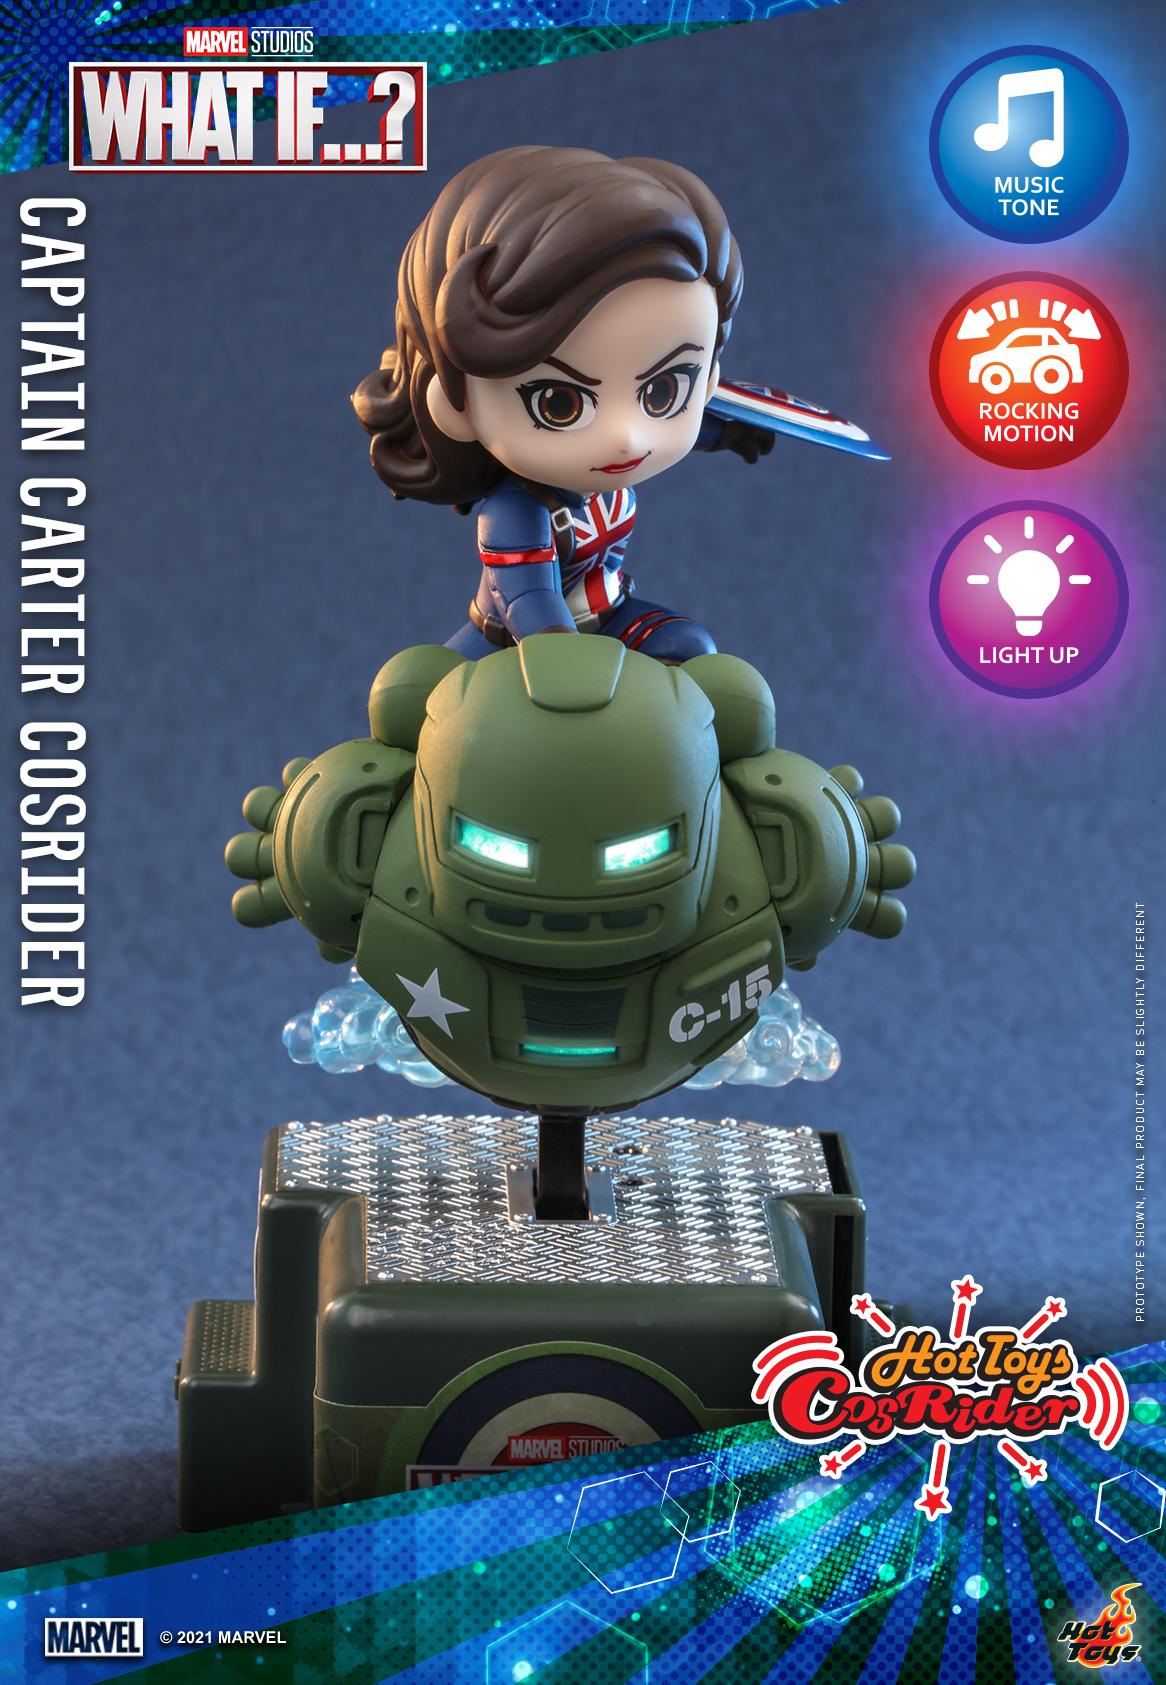 Hot Toys - What If - Captain Carter CosRider_PR2